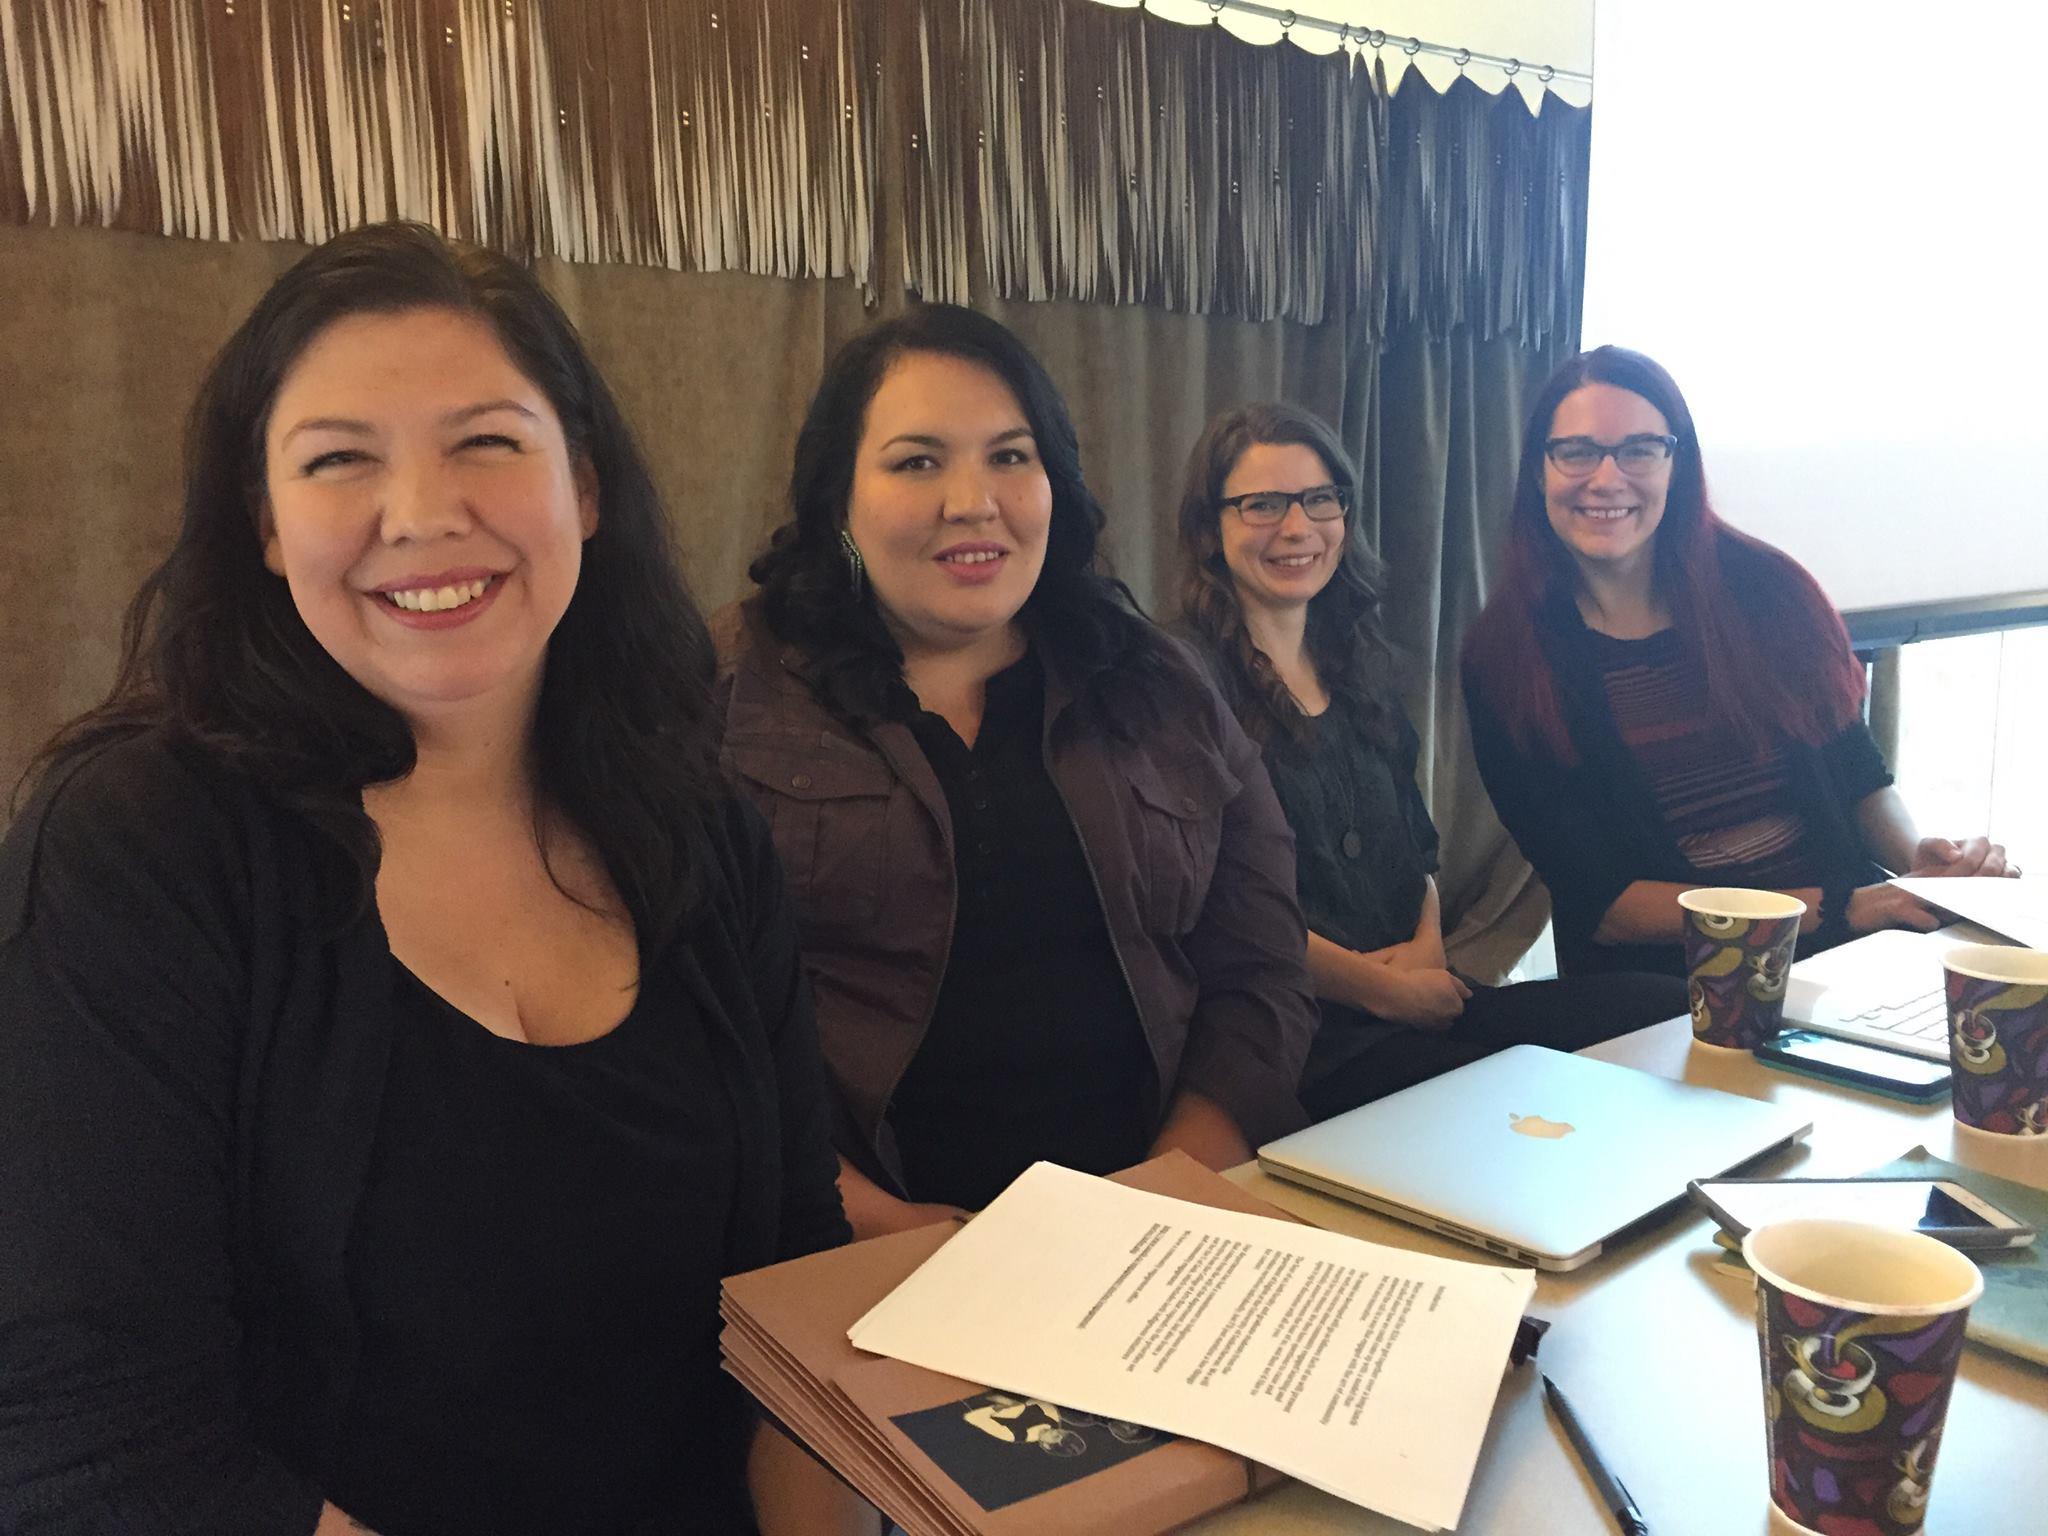 University of Saskatchewan contingent: Tasha Hubbard, Tenille Campbell, ILSA exec Adar Charlton, and Nancy Van Styvendale    photo: tasha hubbard